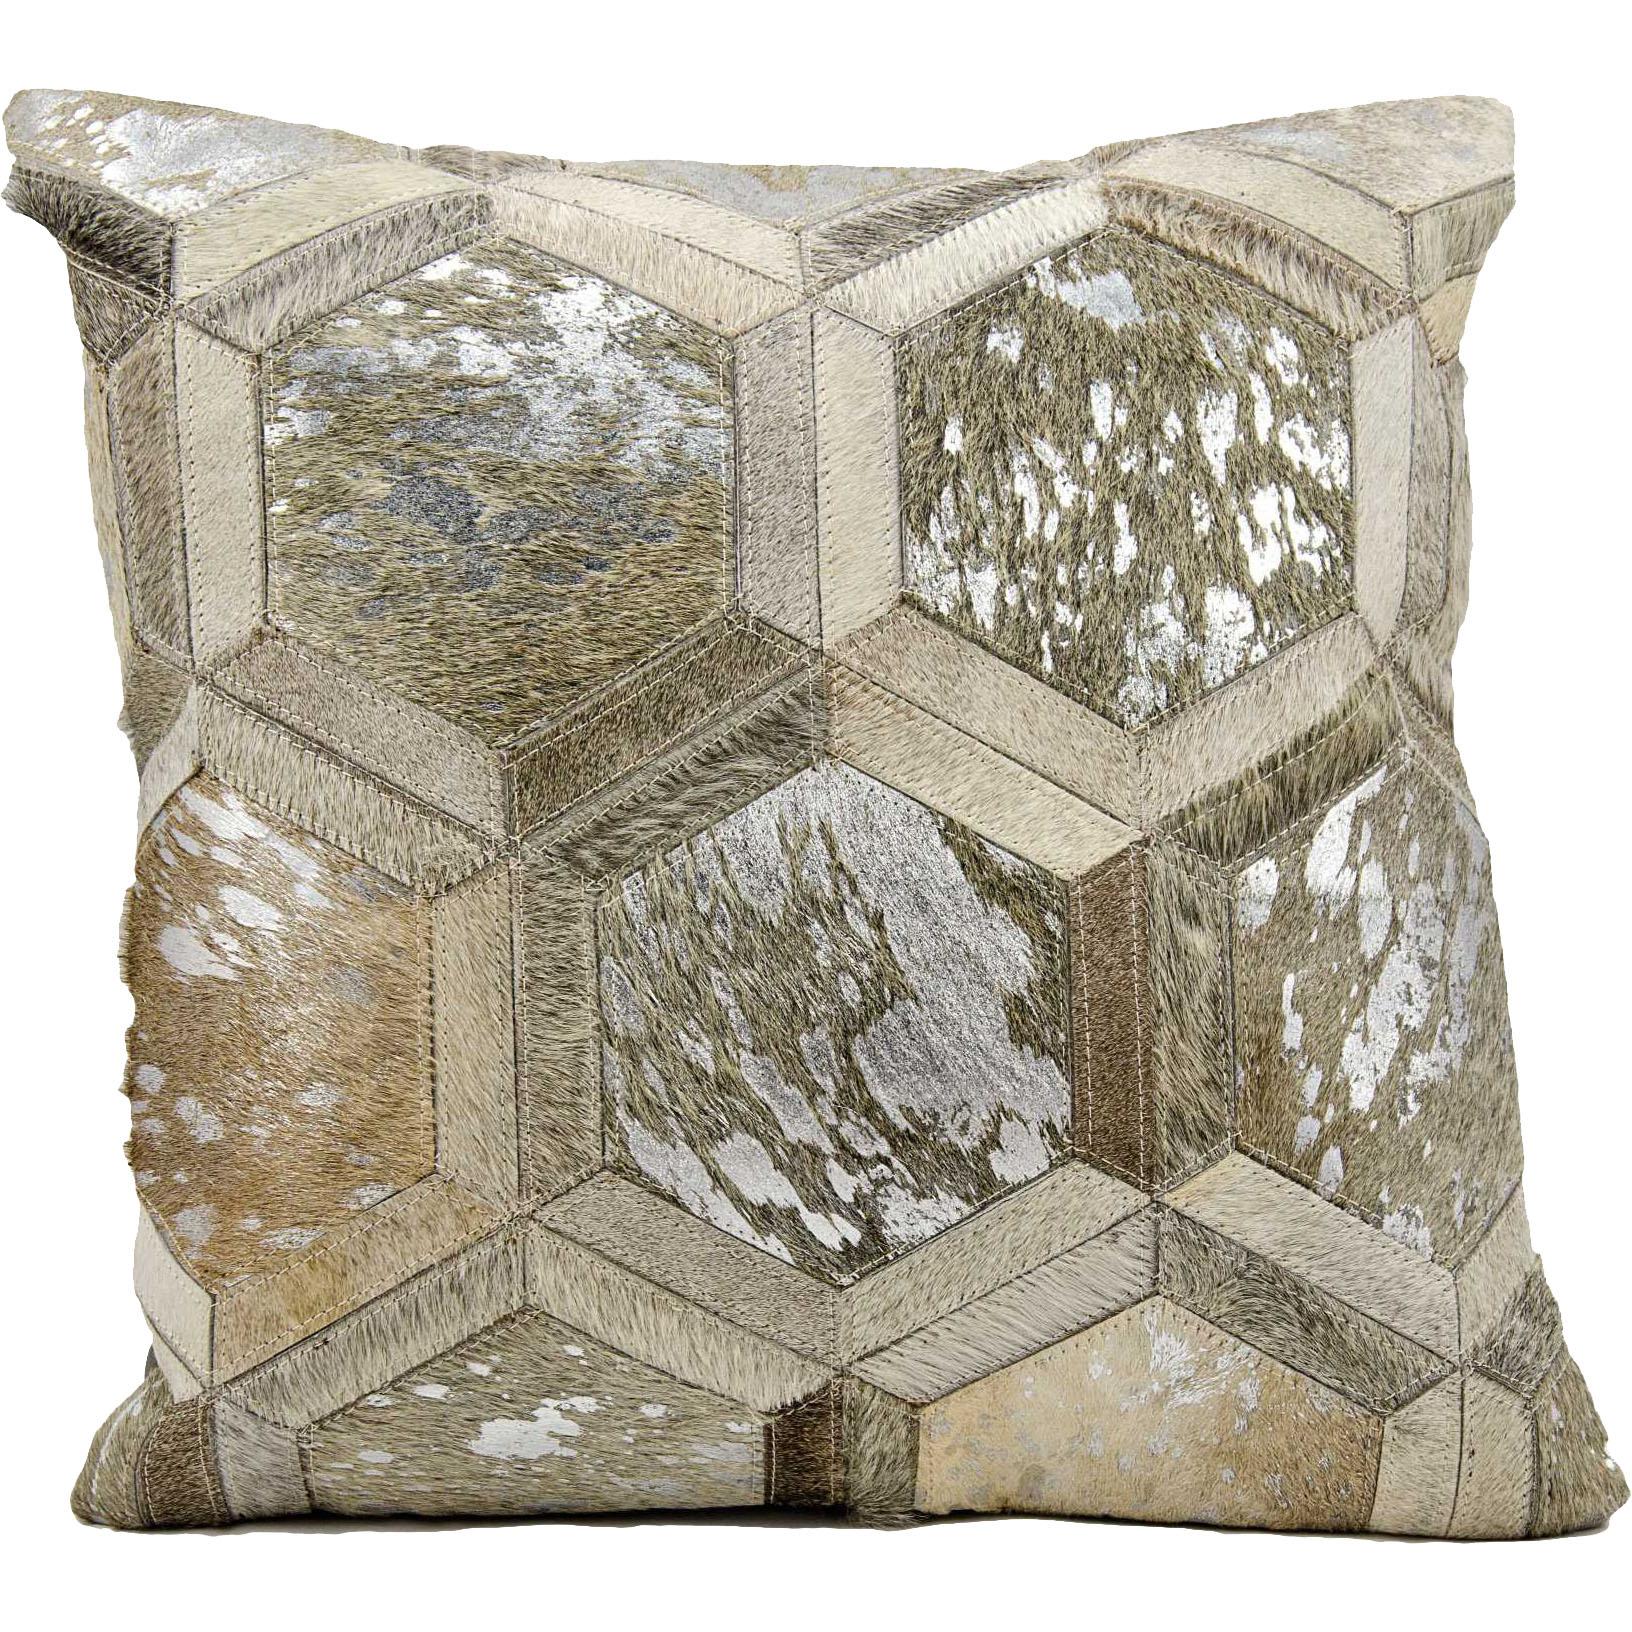 Michael Amini Metallic Hexagon Natural Hair on Hide Grey Silver Throw Pillow